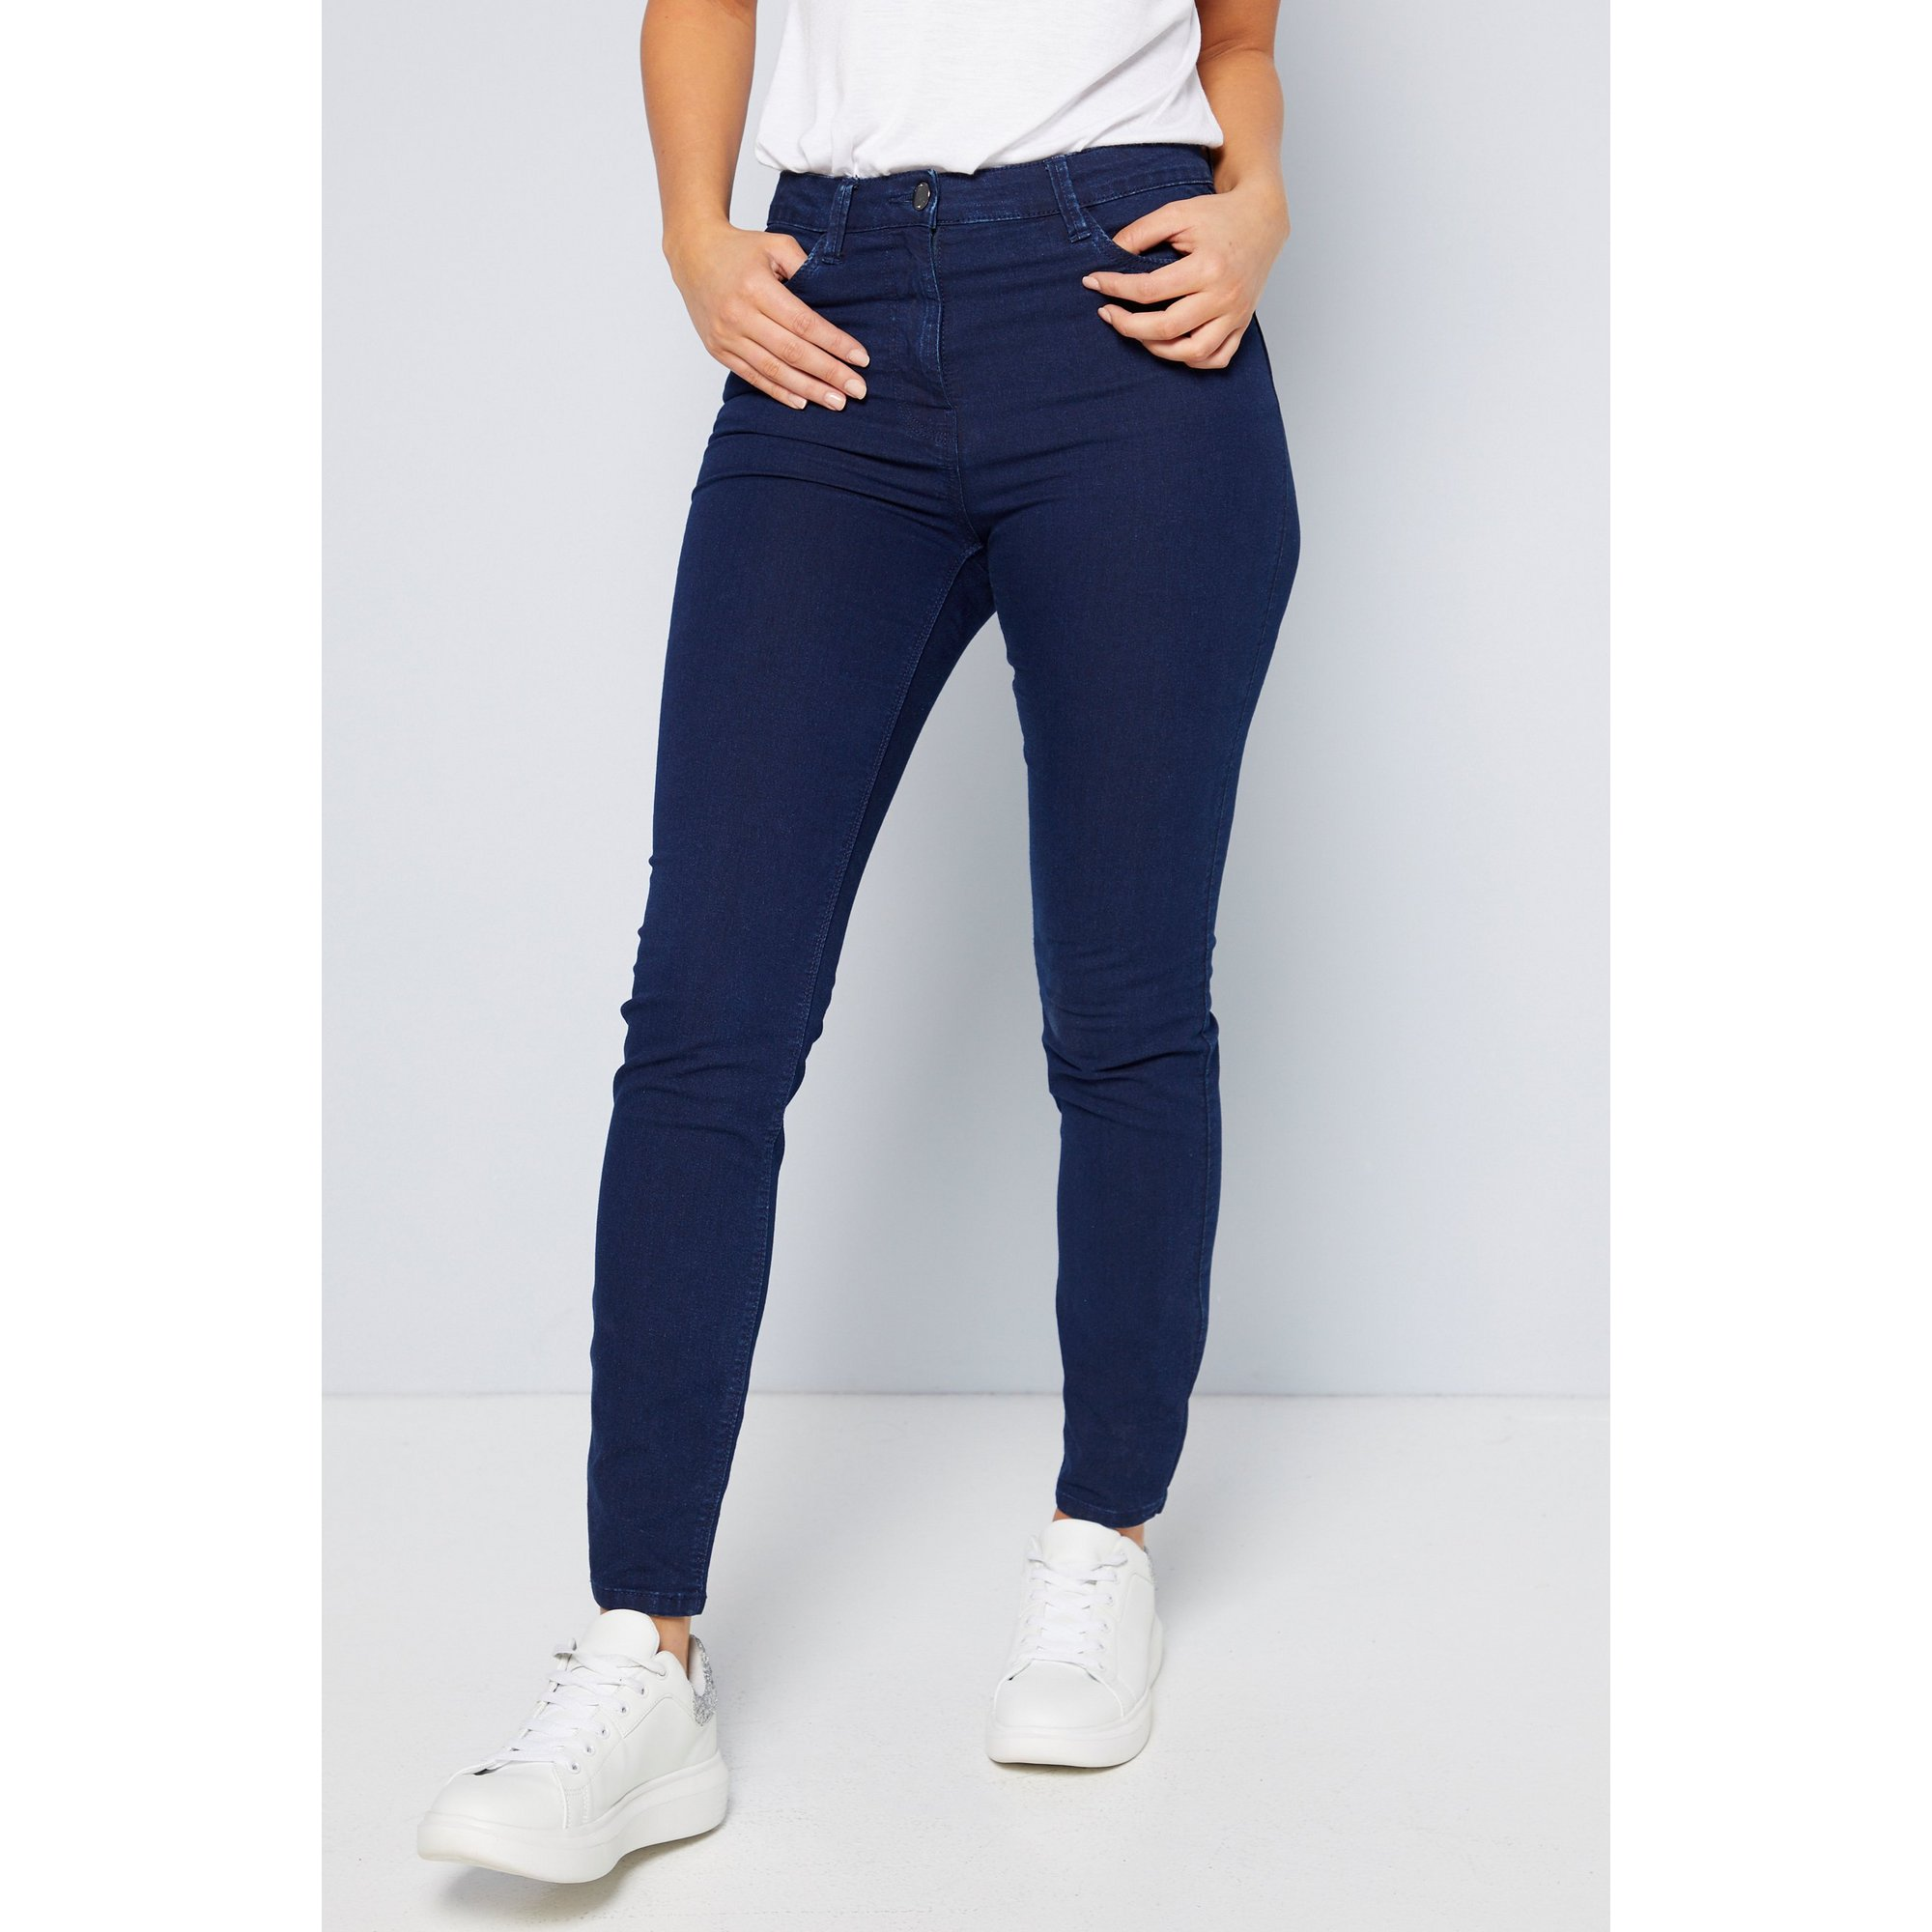 Image of Aimee Slim Fit Indigo Jeans